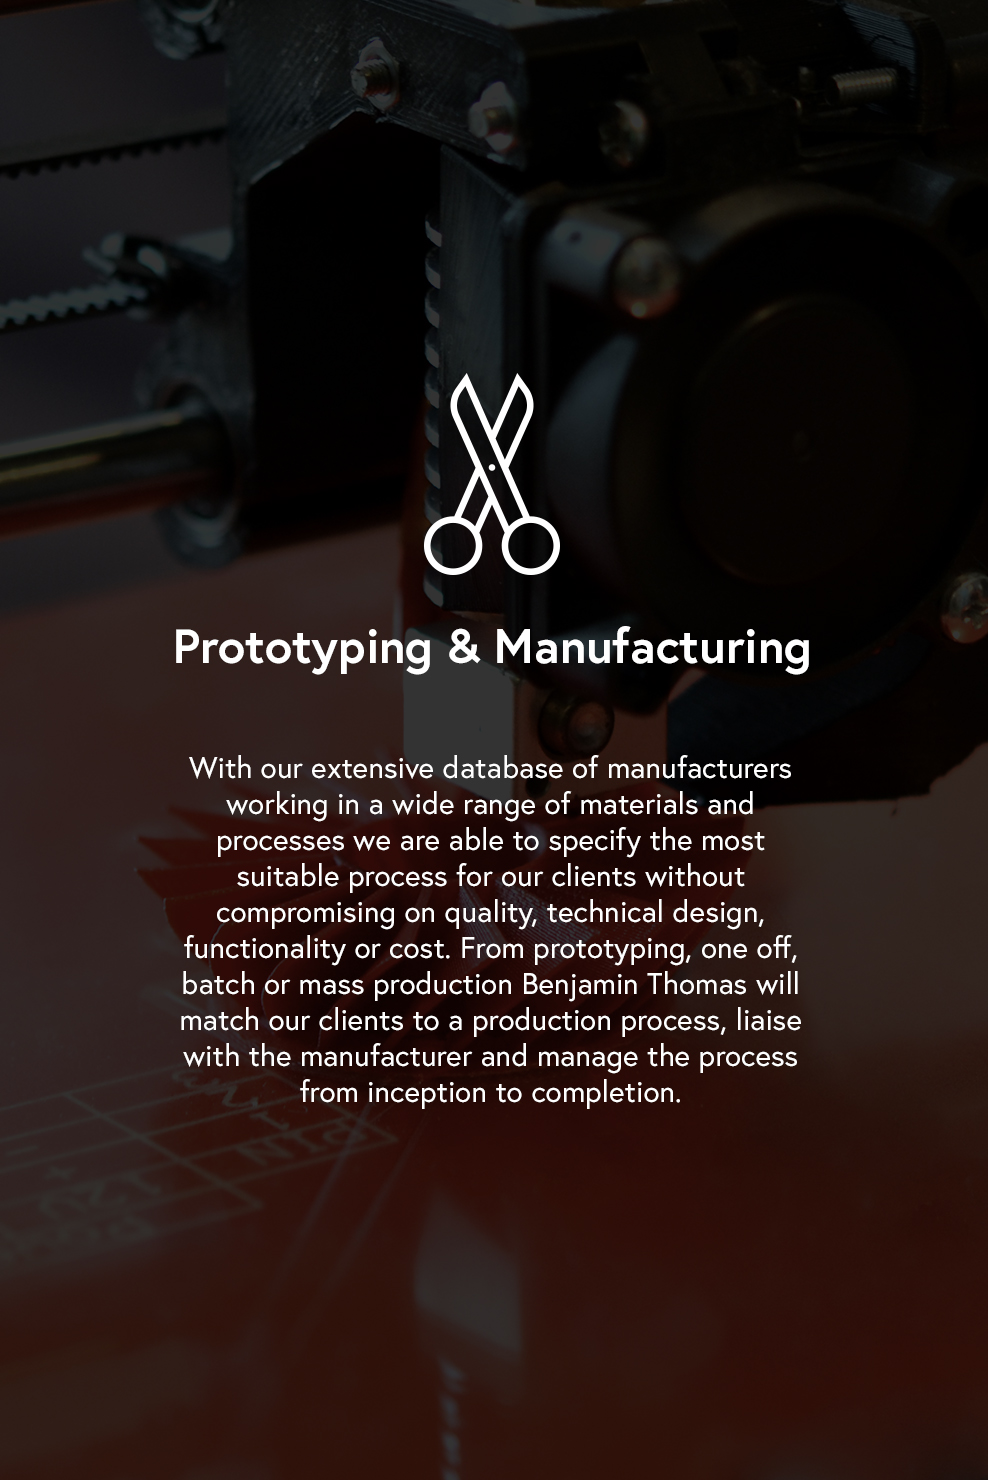 prototyping-manufacturing.jpg